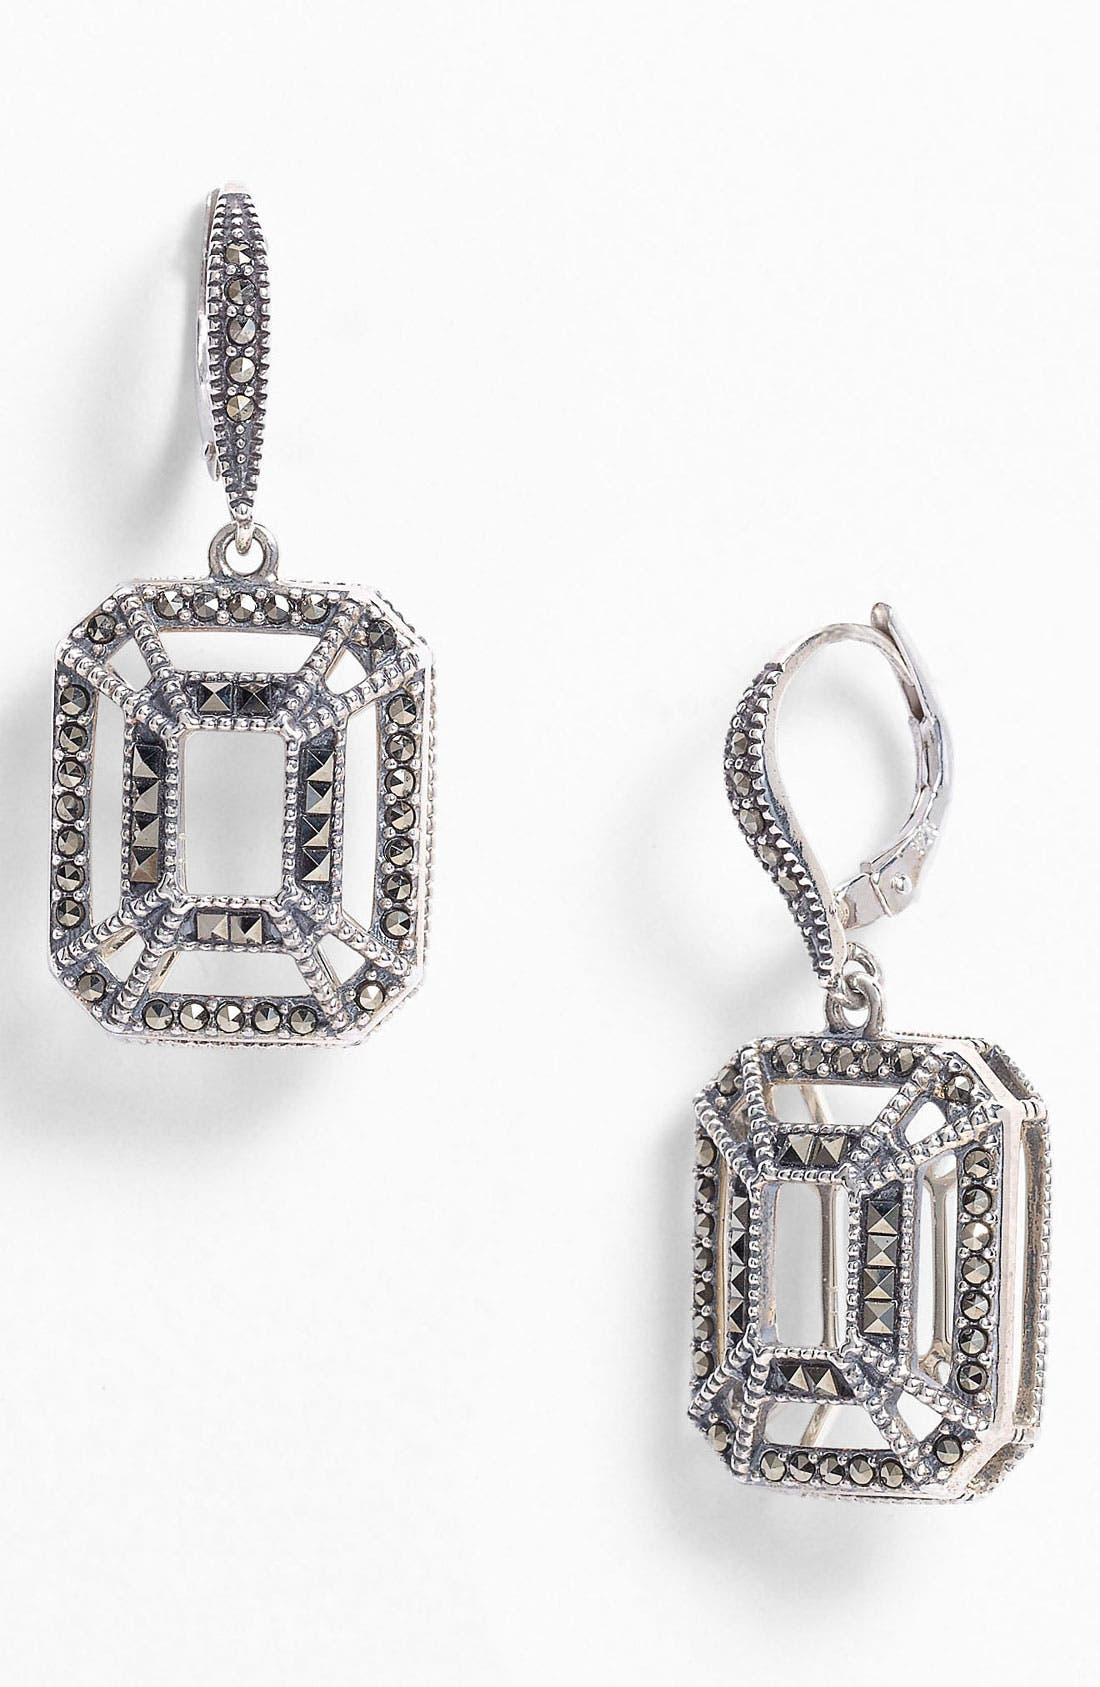 Alternate Image 1 Selected - Judith Jack 'Caged In' Drop Earrings